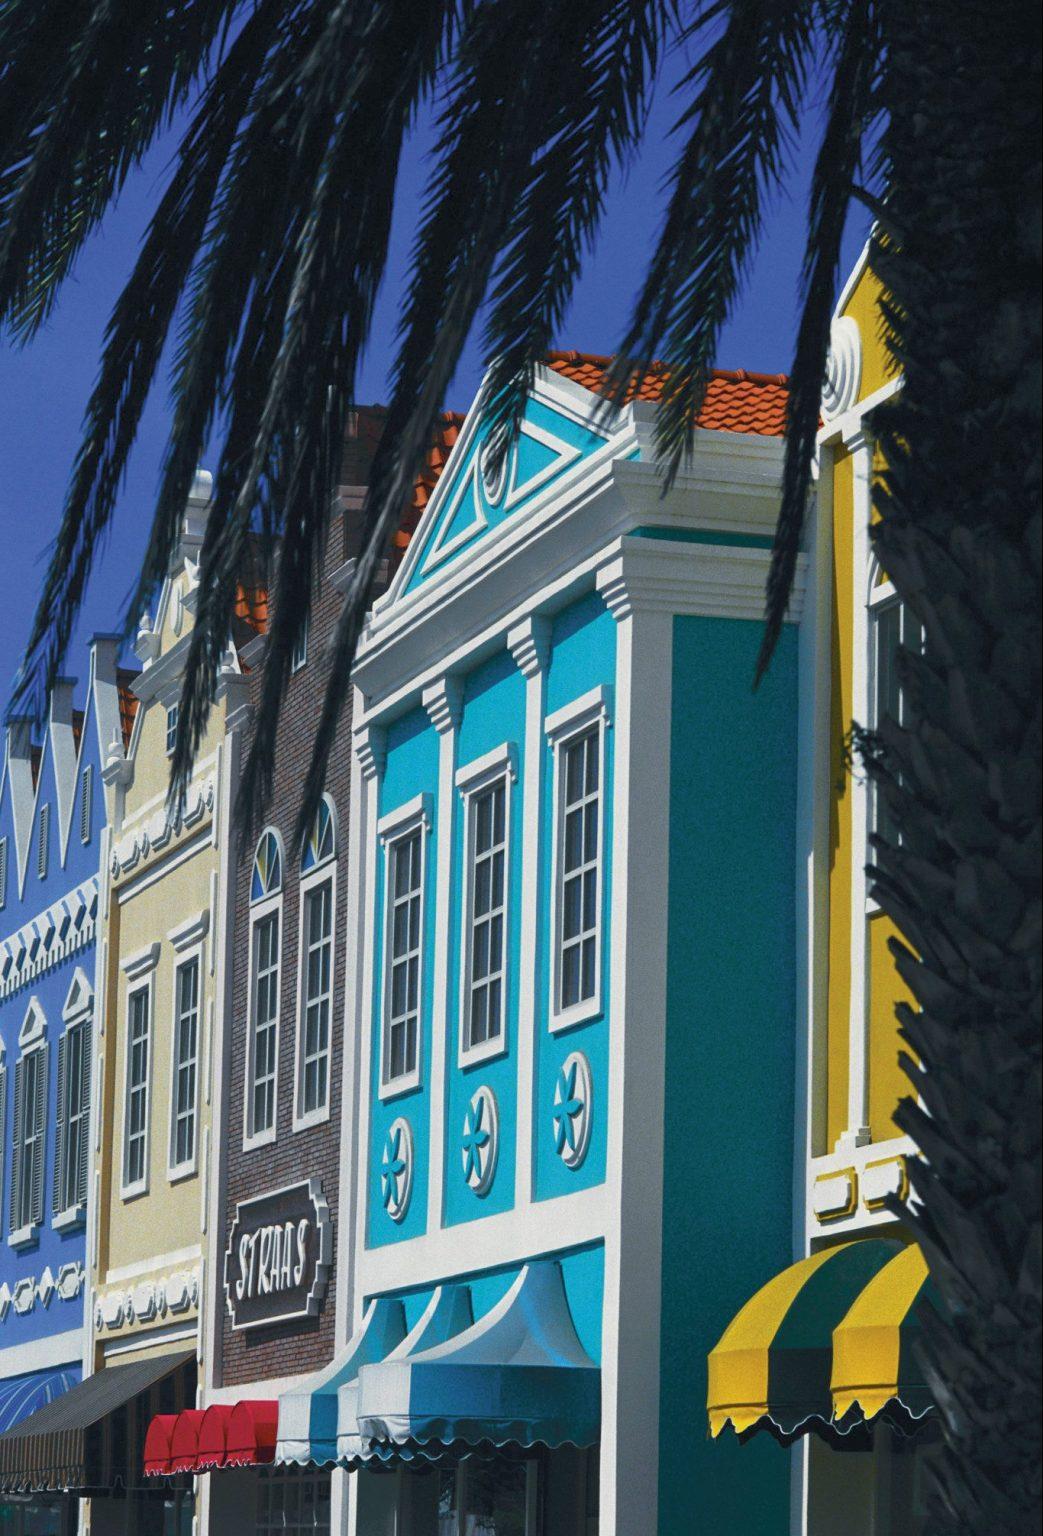 Färgglada hus i Curacao